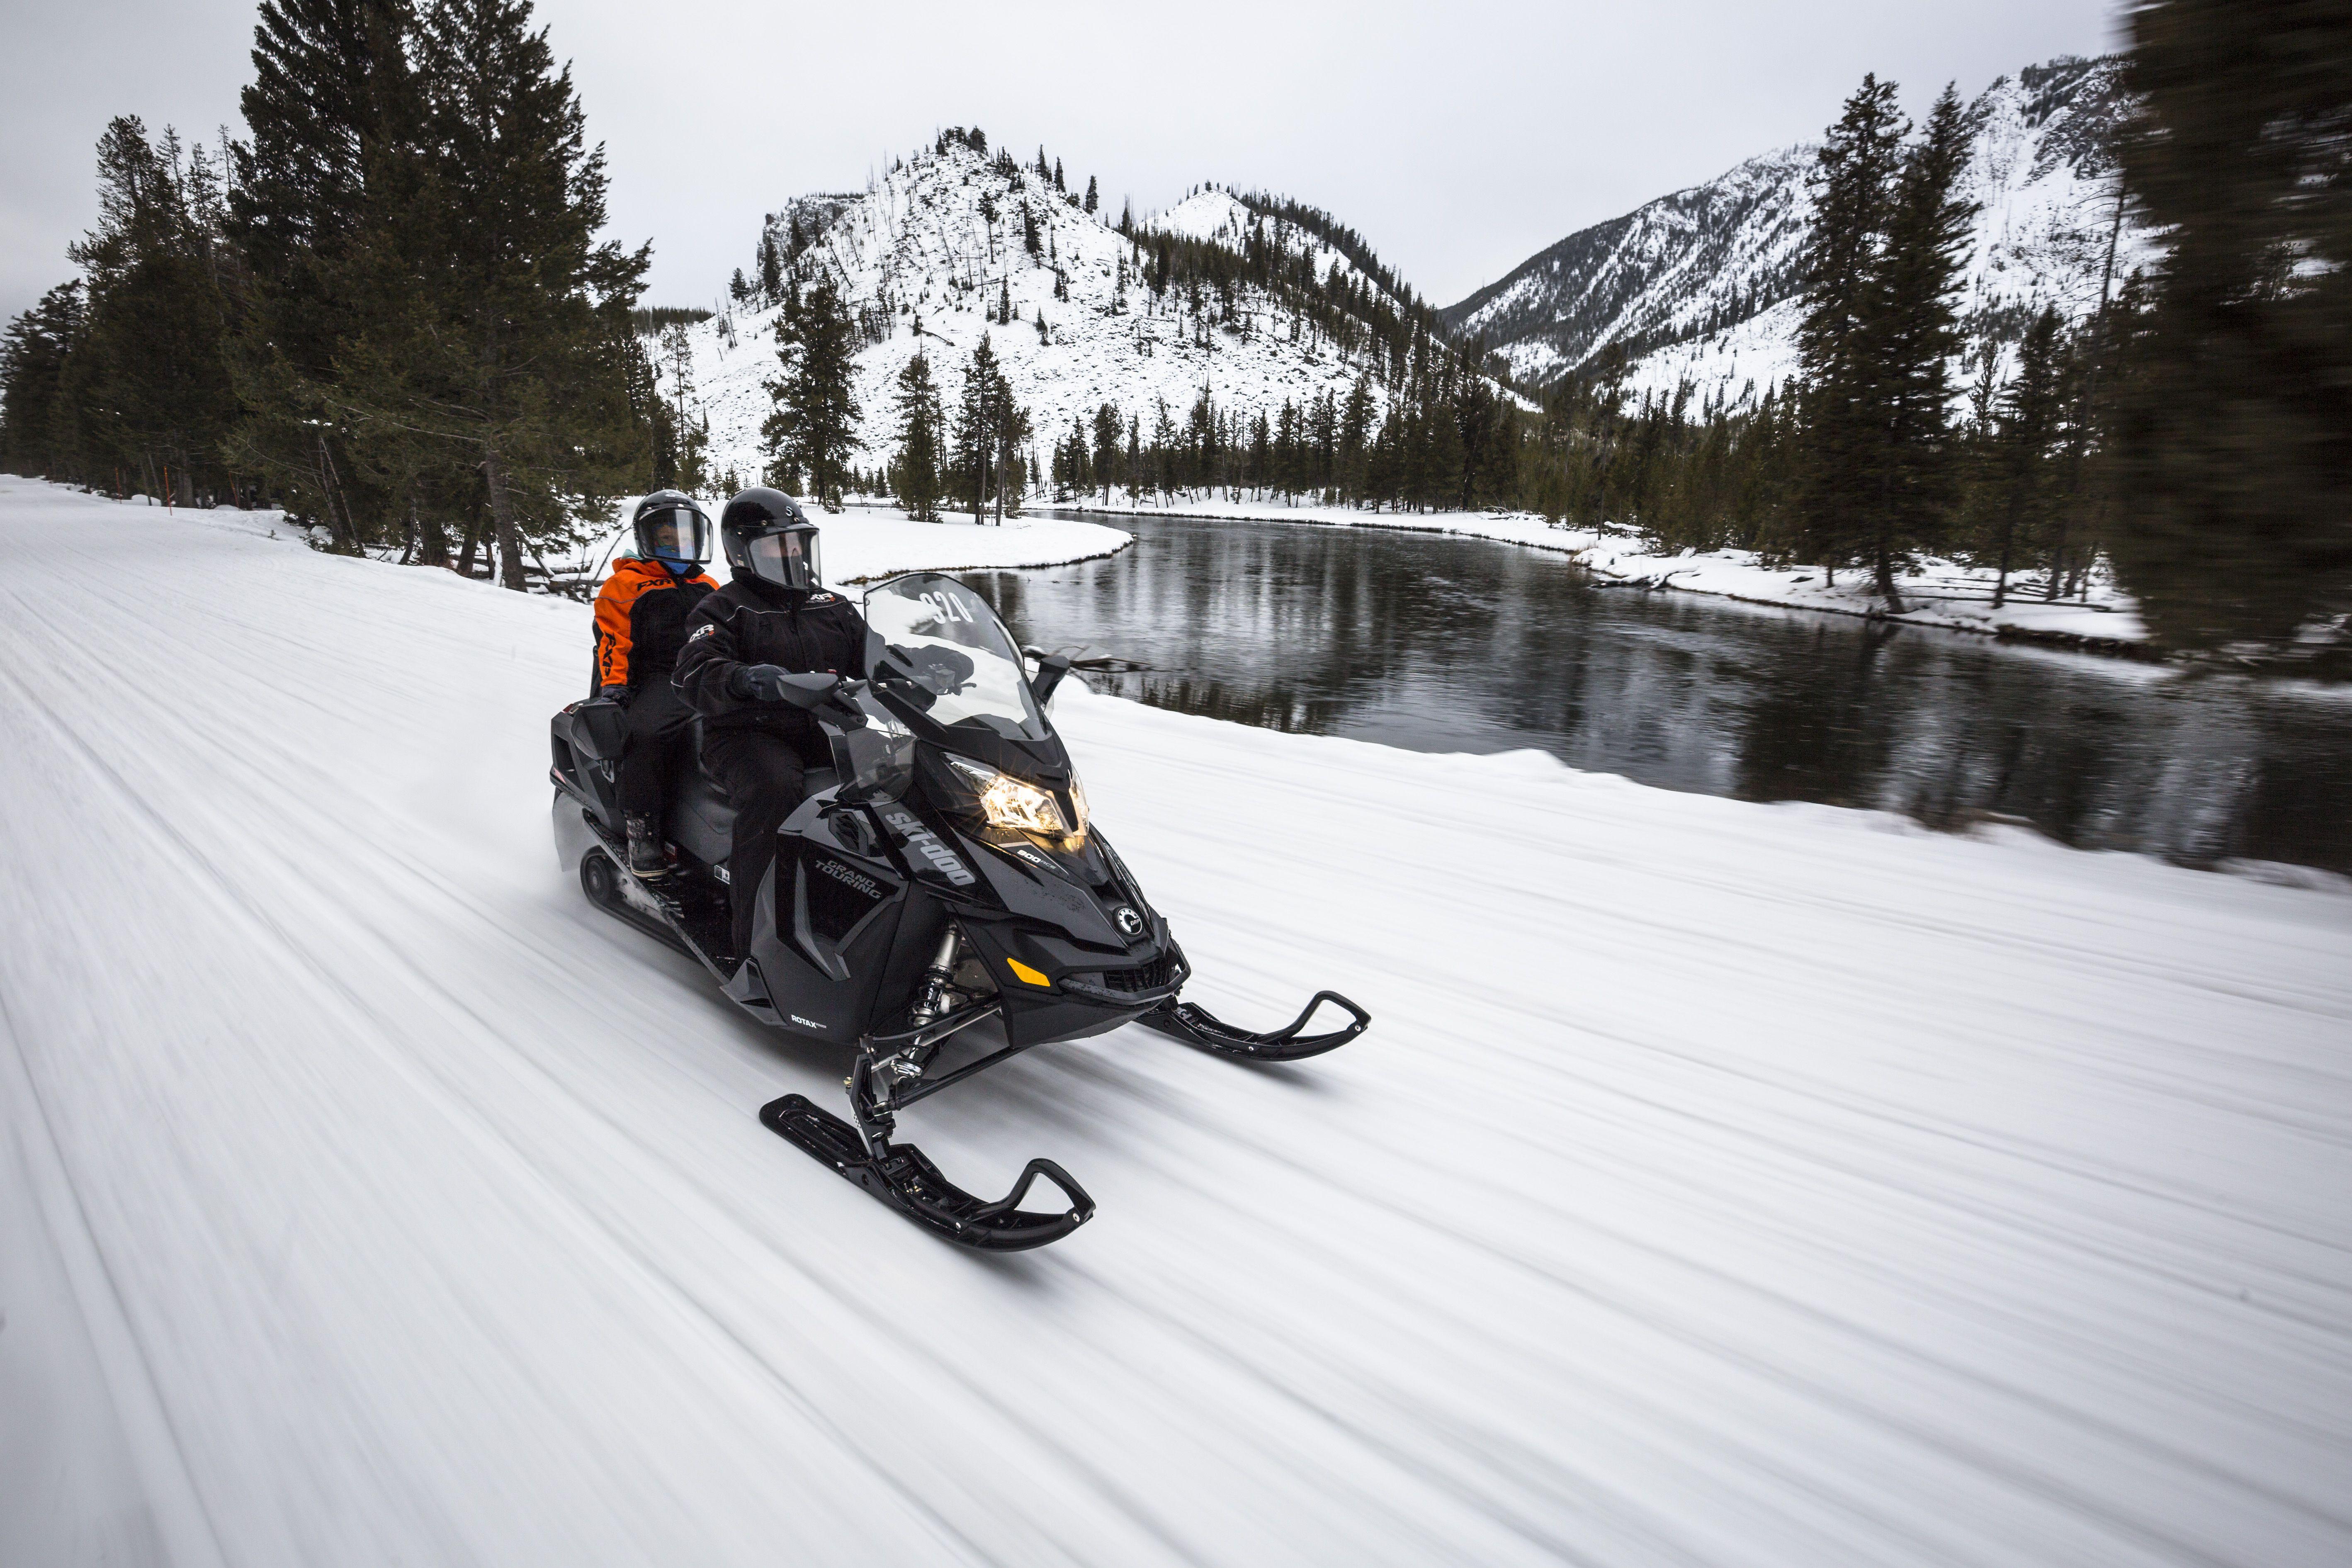 Talk About Adventure Yellowstone Vacation Yellowstone Tours Snowmobile Tours